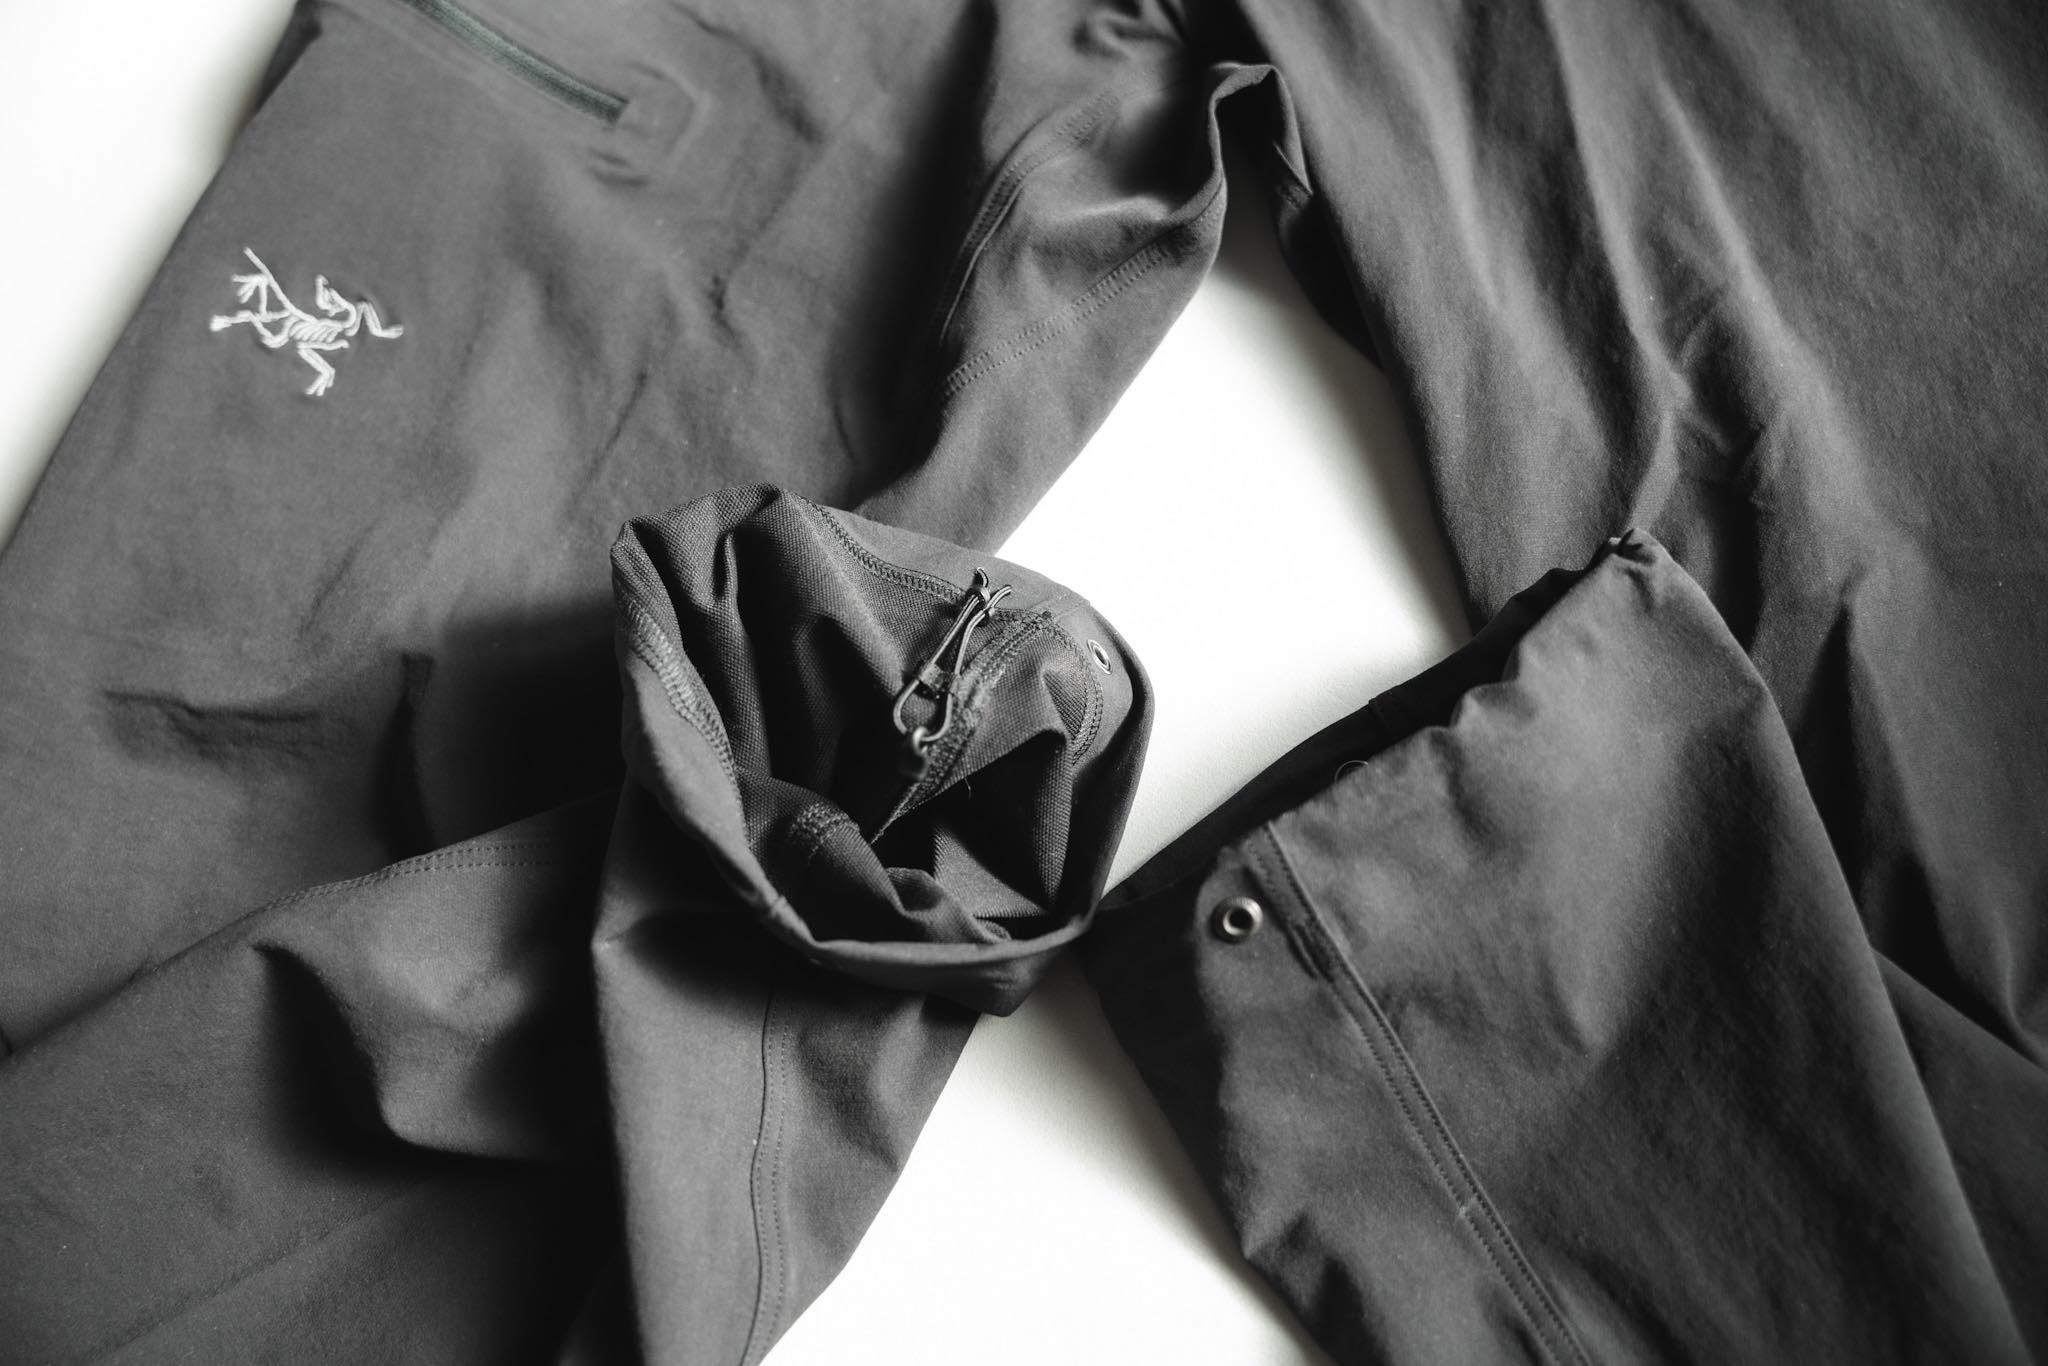 ARC'TERYX(アークテリクス)ガンマLTパンツ|調節可能なパンツ裾のドローコード